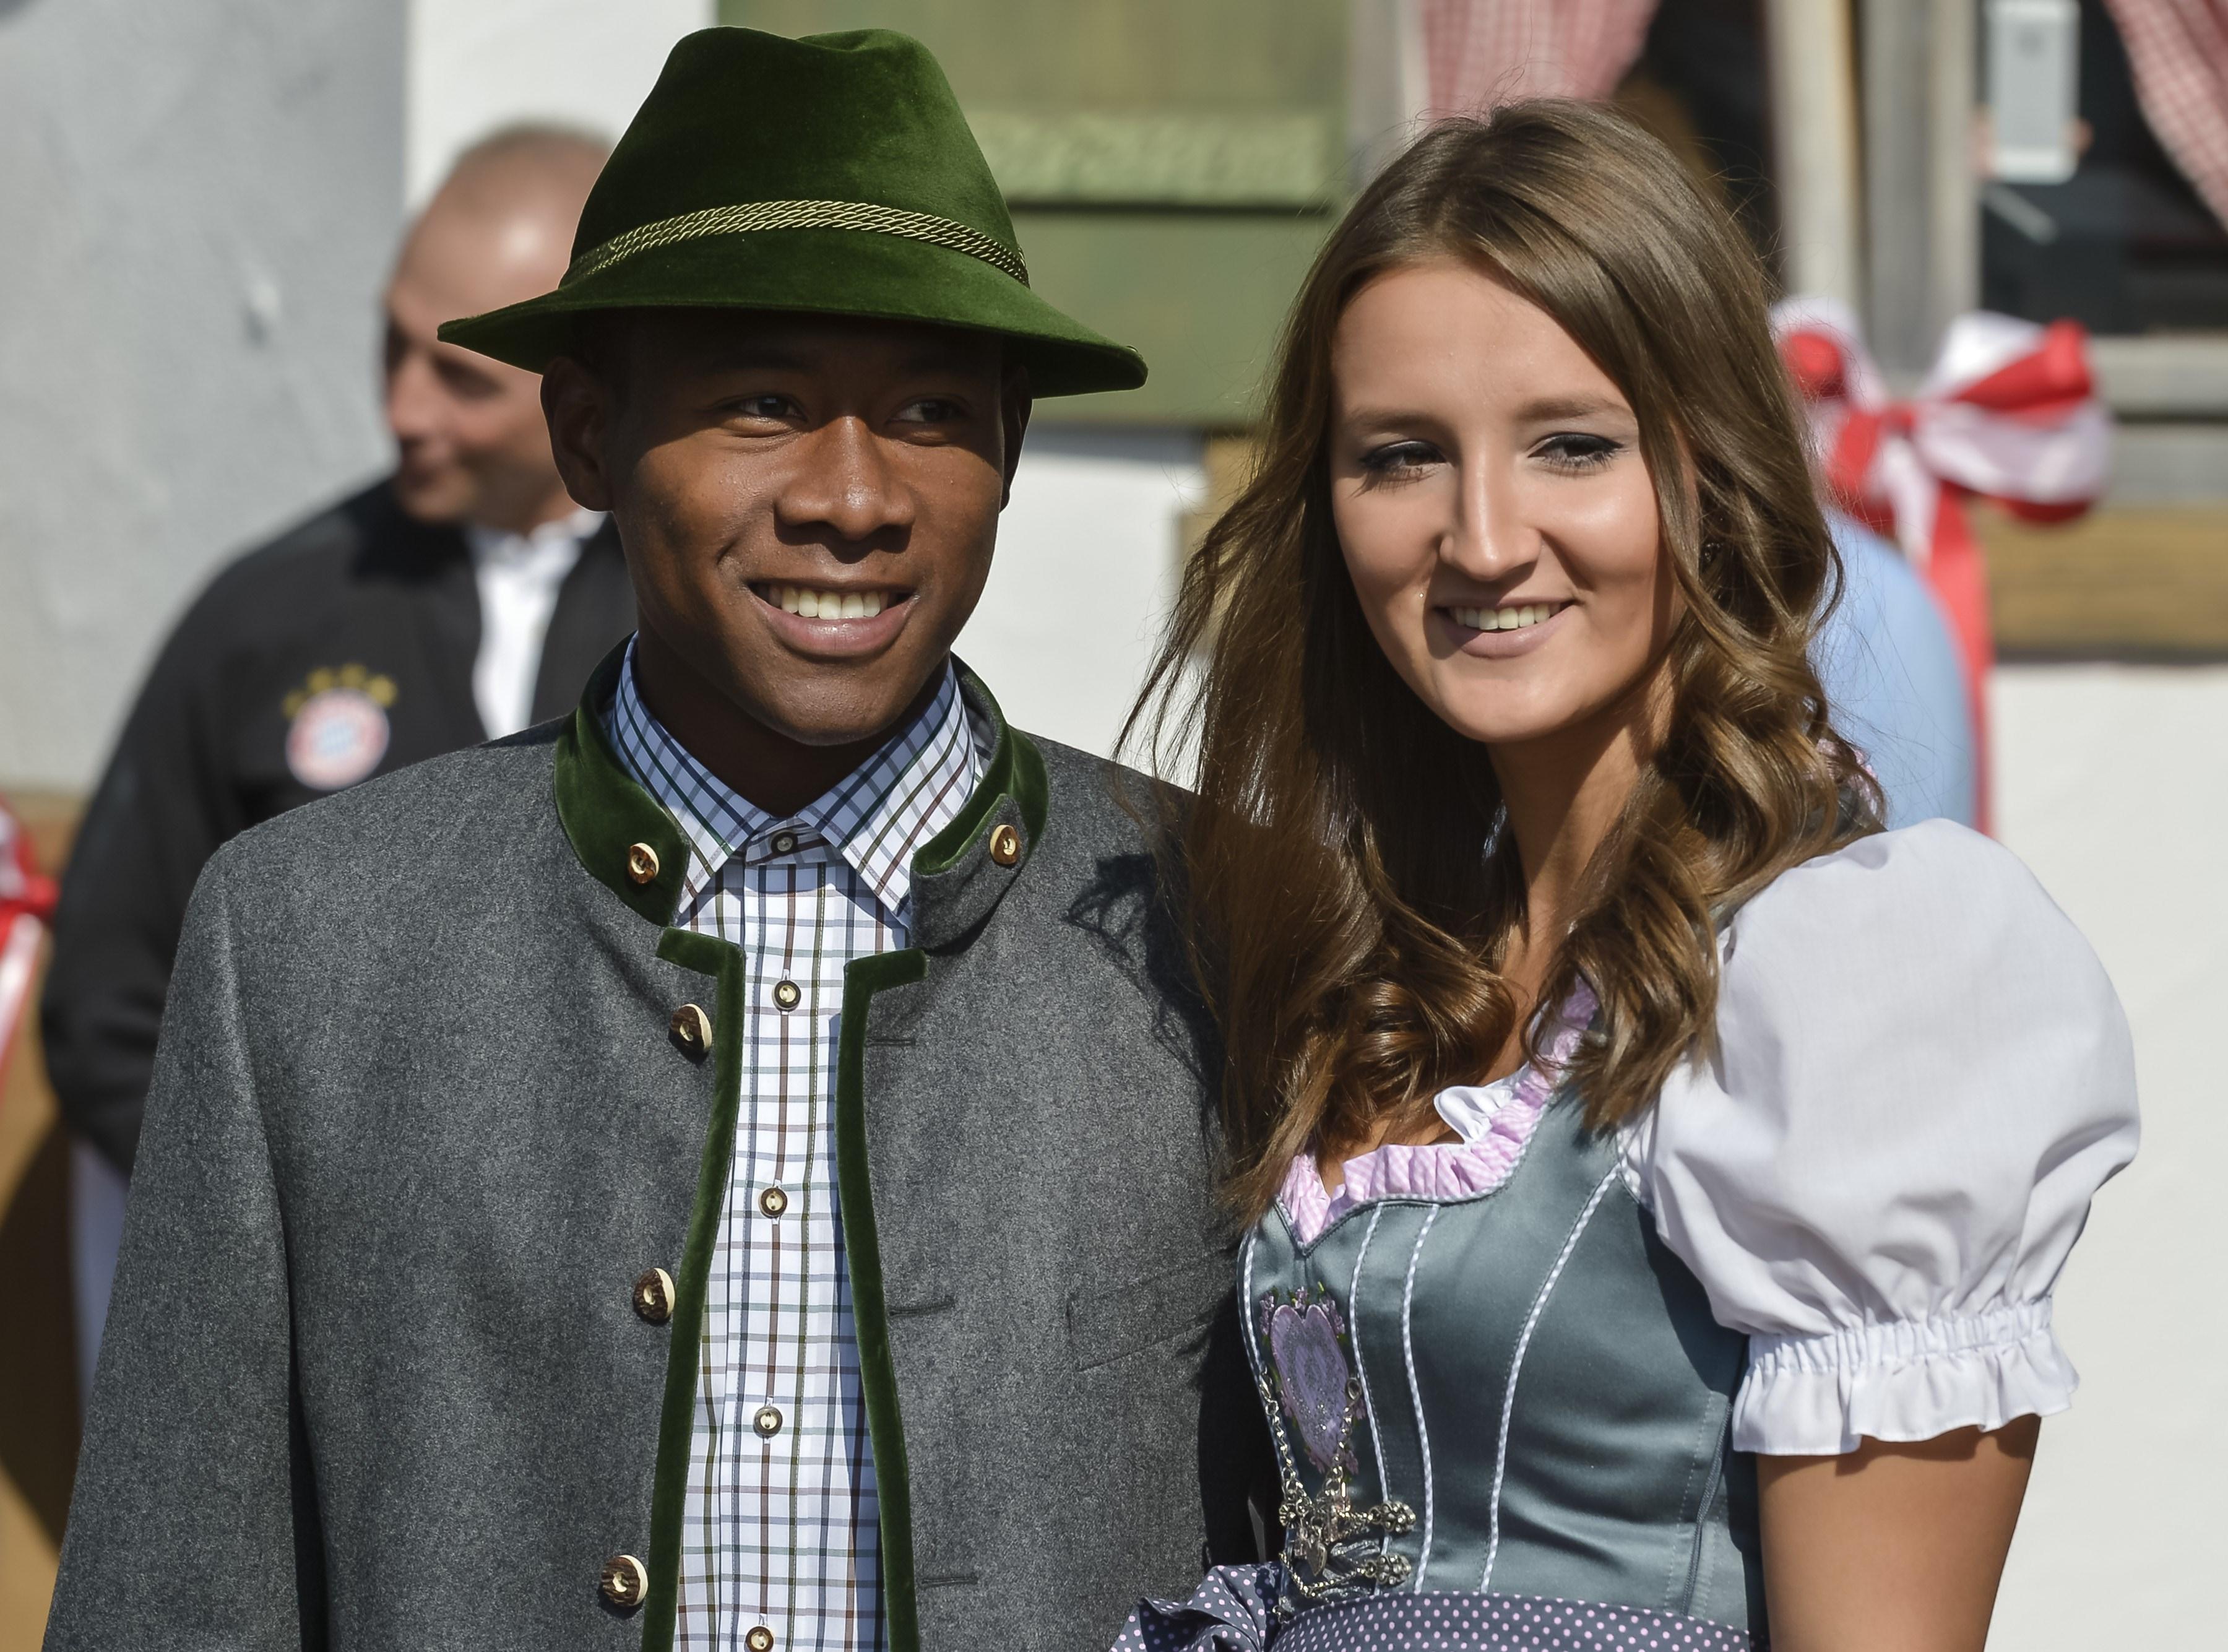 David Alaba feiert mit Freundin auf dem Oktoberfest  Sky